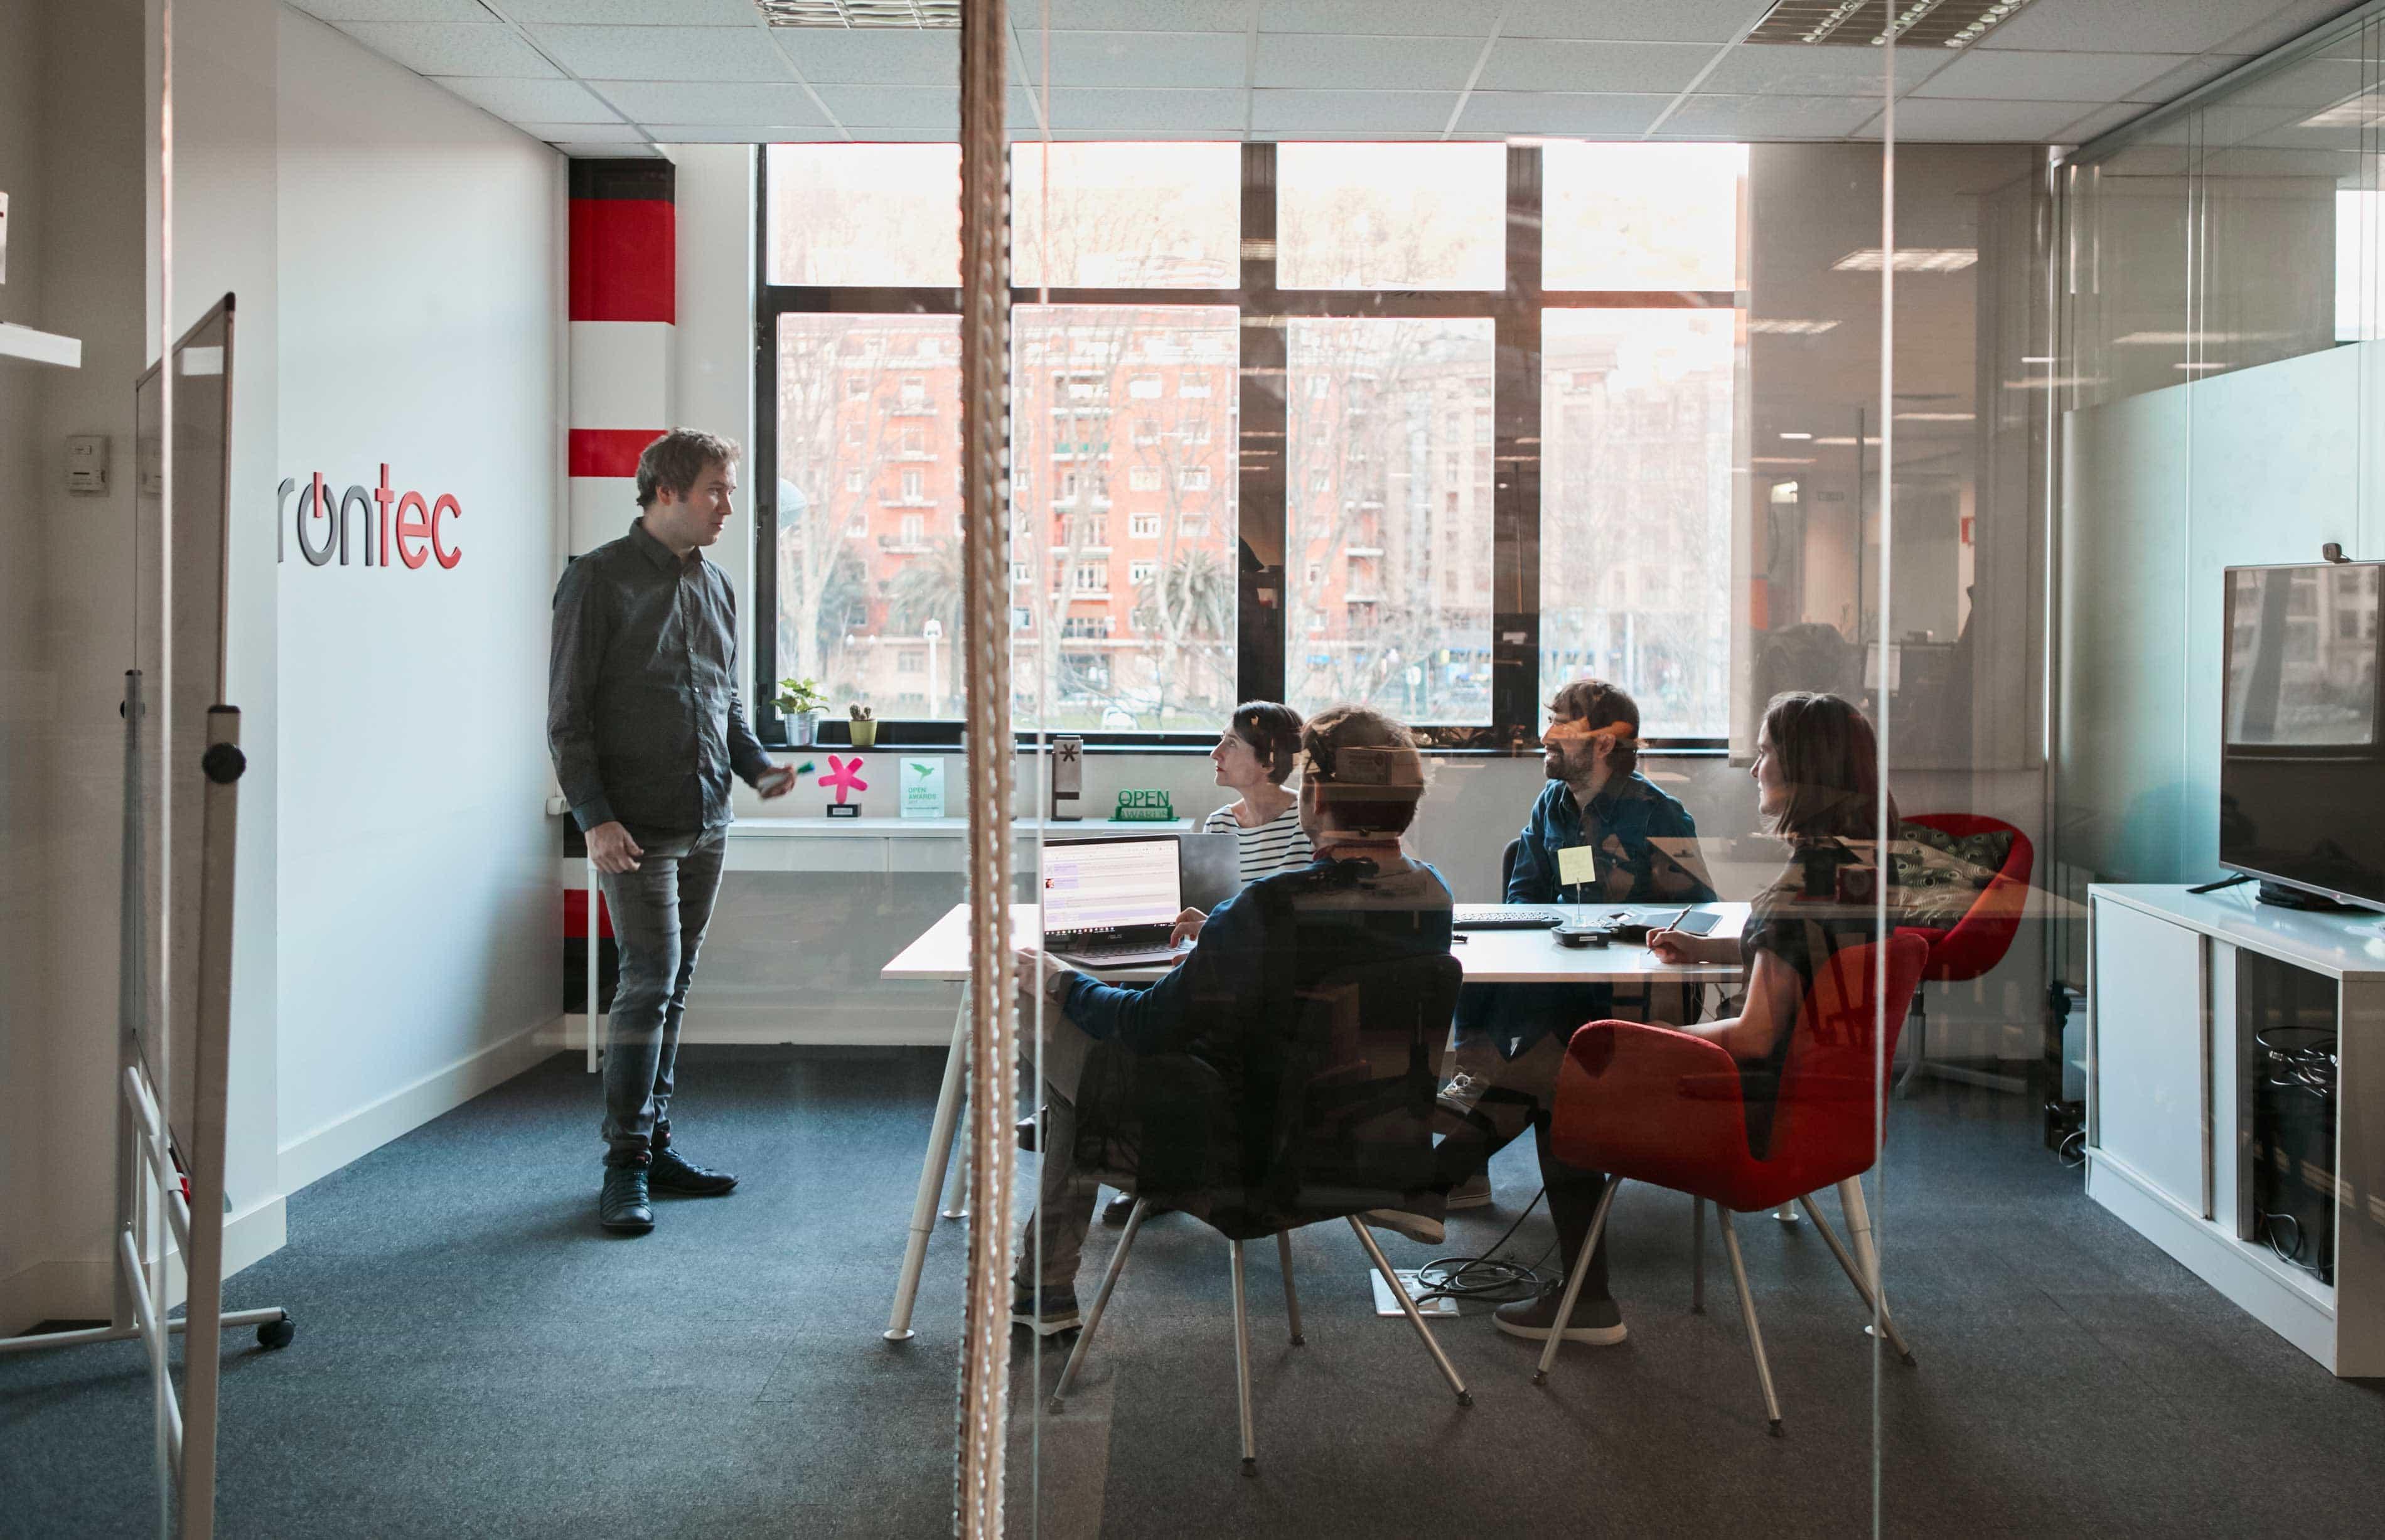 irontec oficina open awards 2019